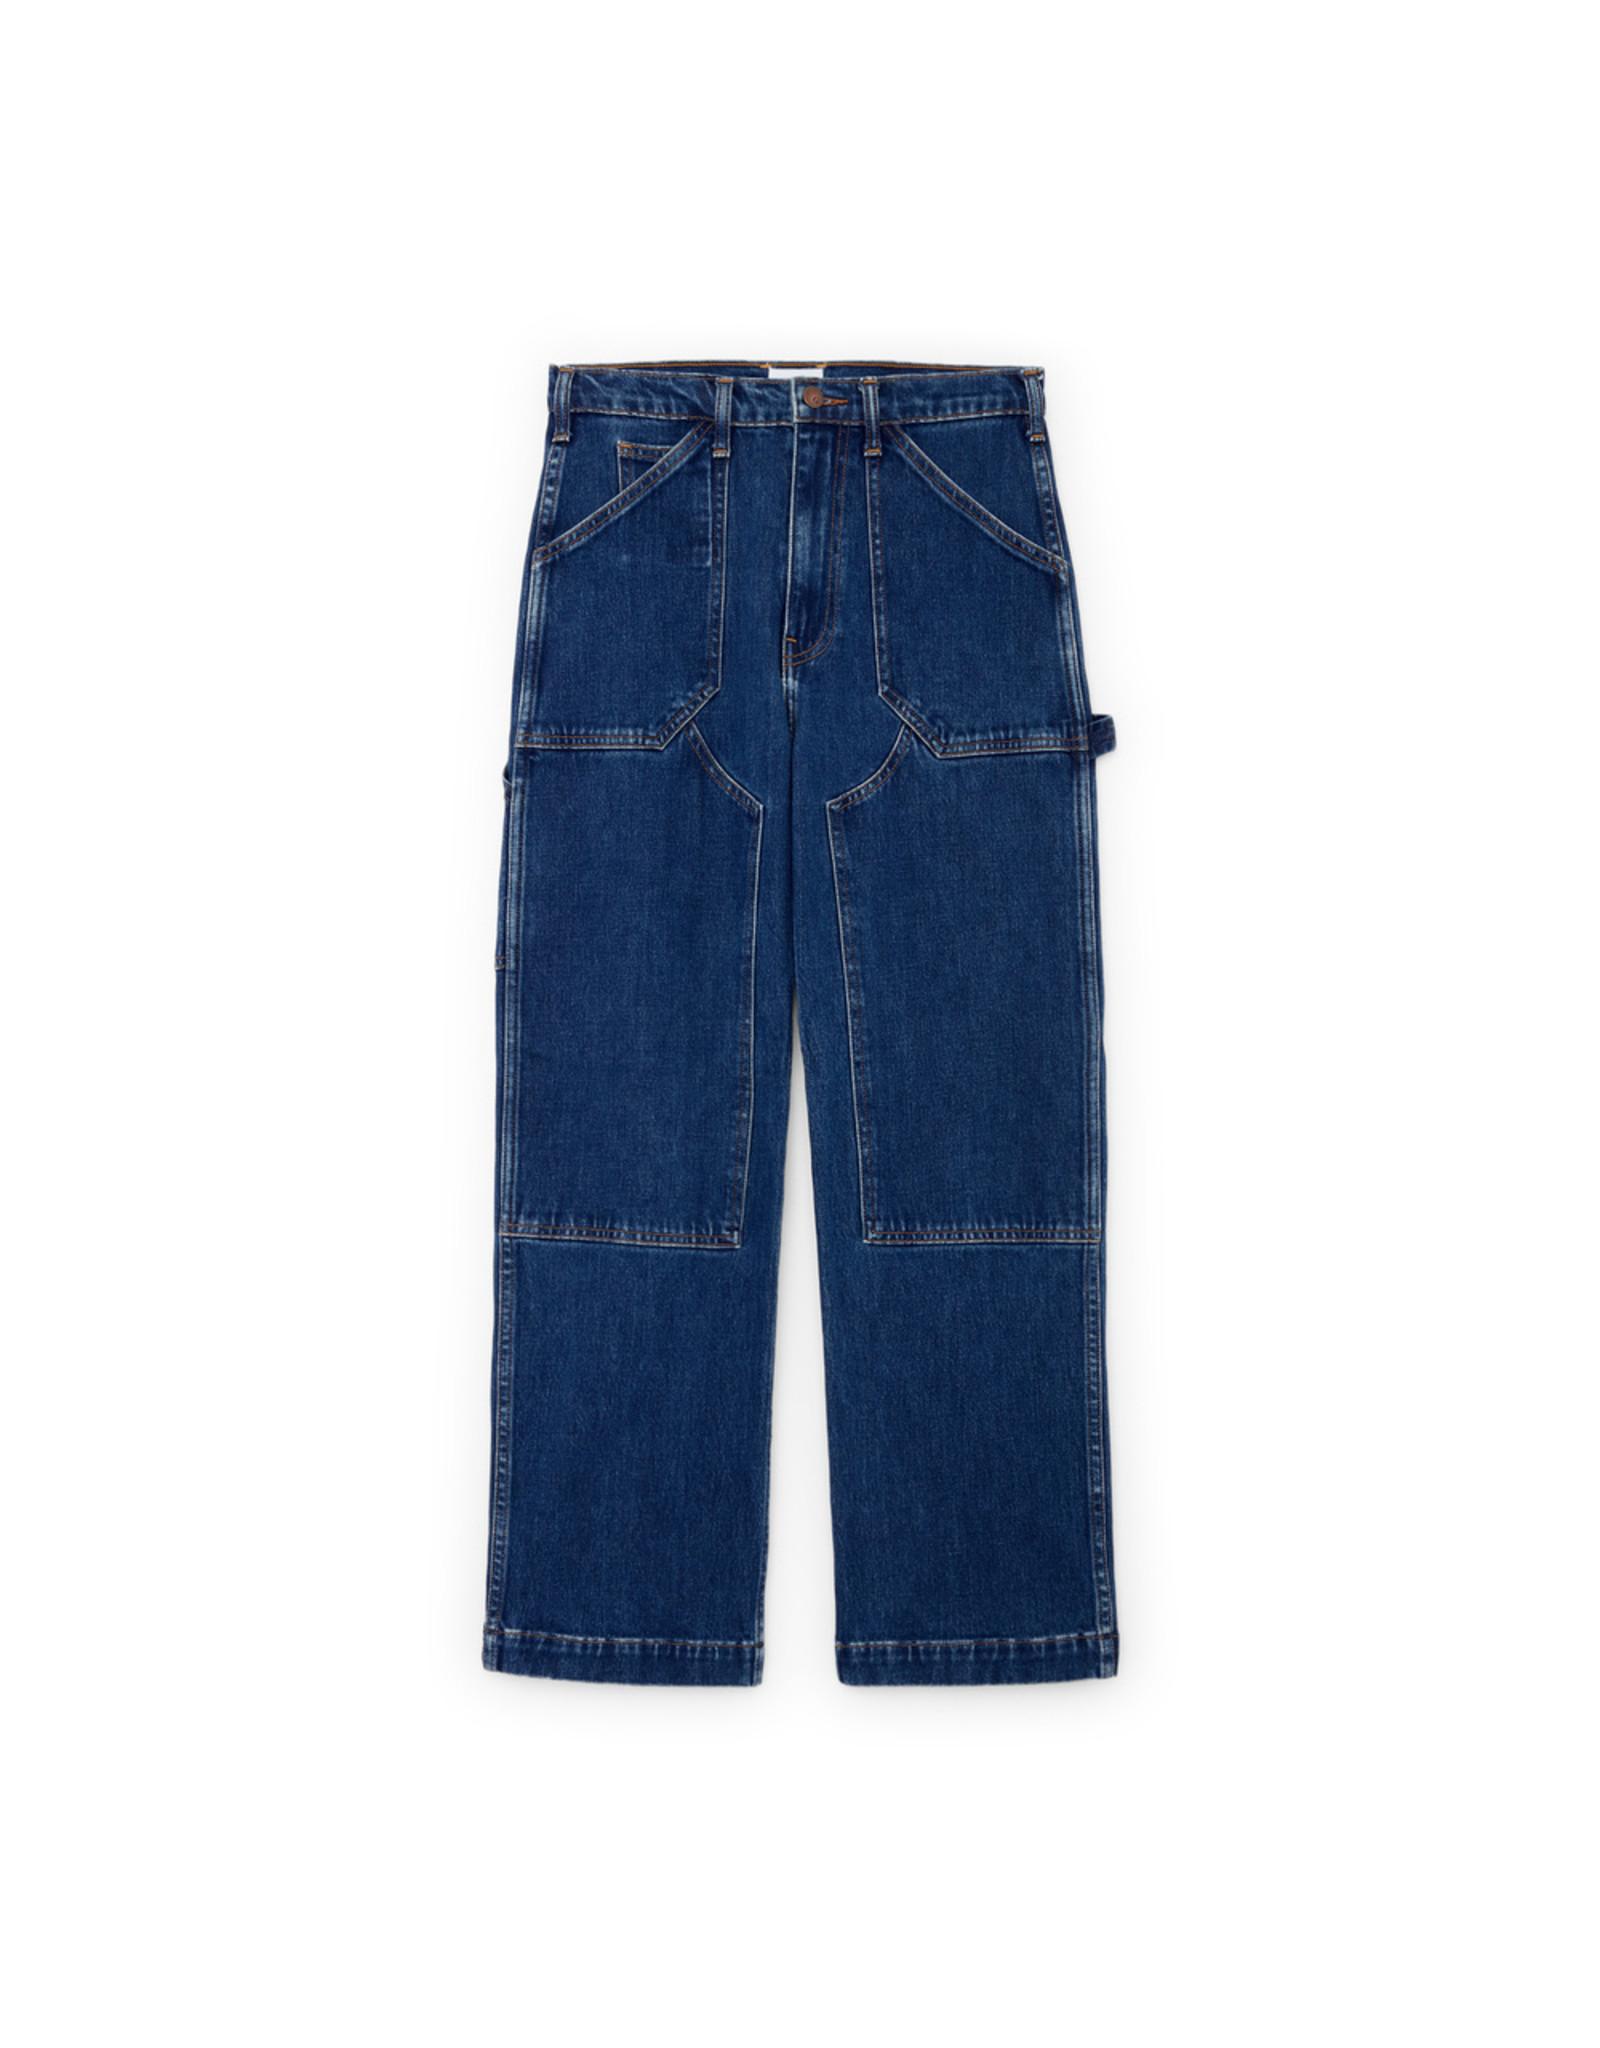 G. Label G. Label JP Workwear Jeans - Medium Blue Wash (Size: 25)